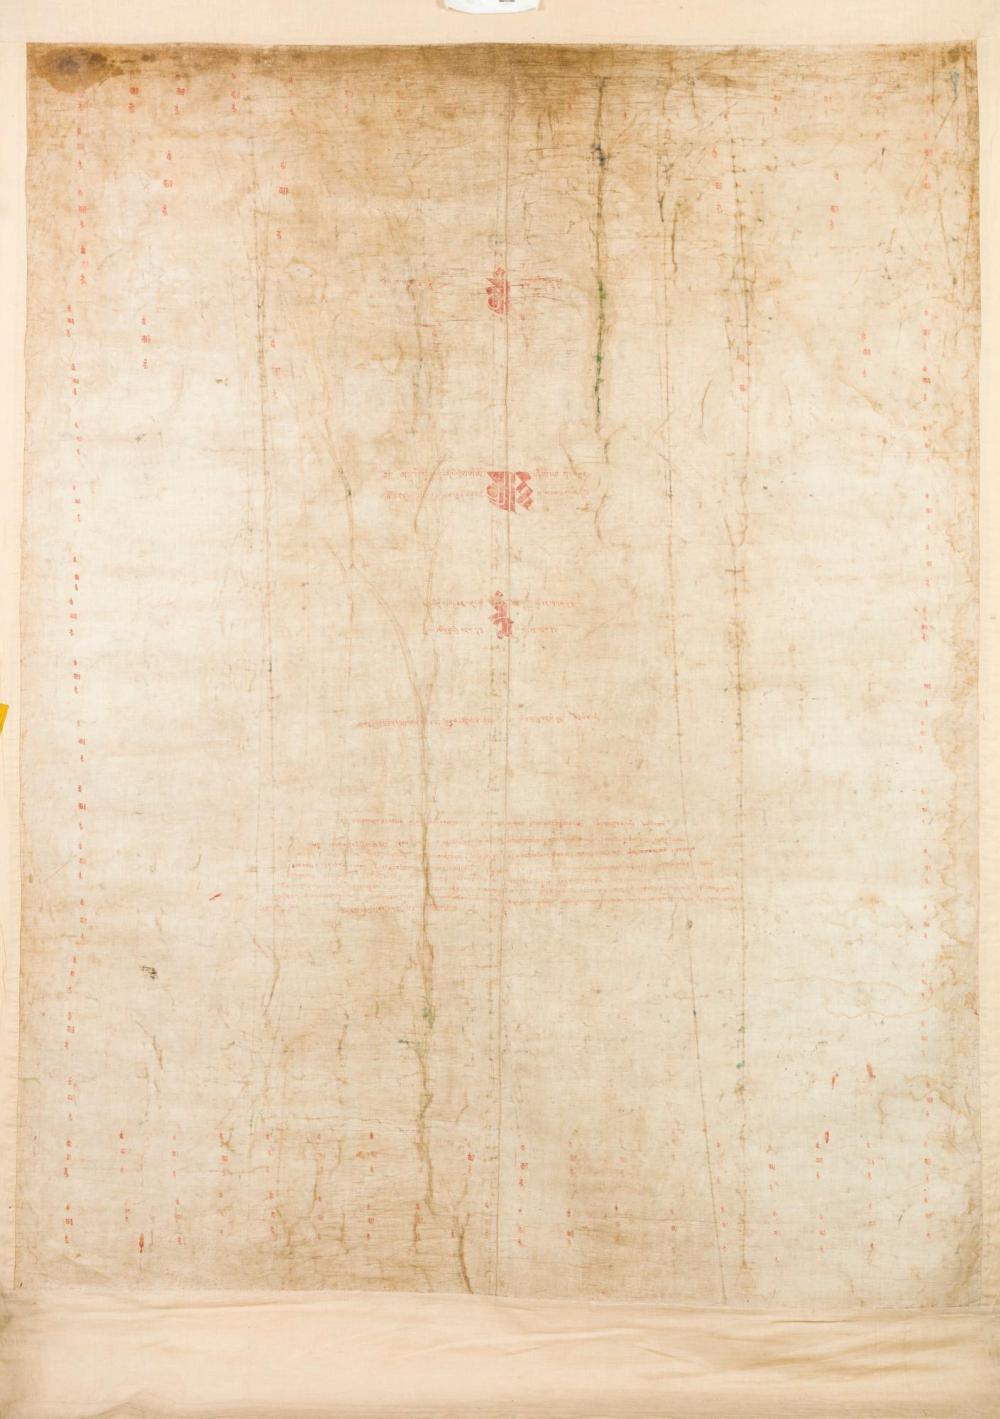 GRAND TANGKA REPRÉSENTANT UN ABBÉ DU MONASTÈRE DE NGOR TIBET CENTRAL, PROVINCE DE TSANG, CA.1704  